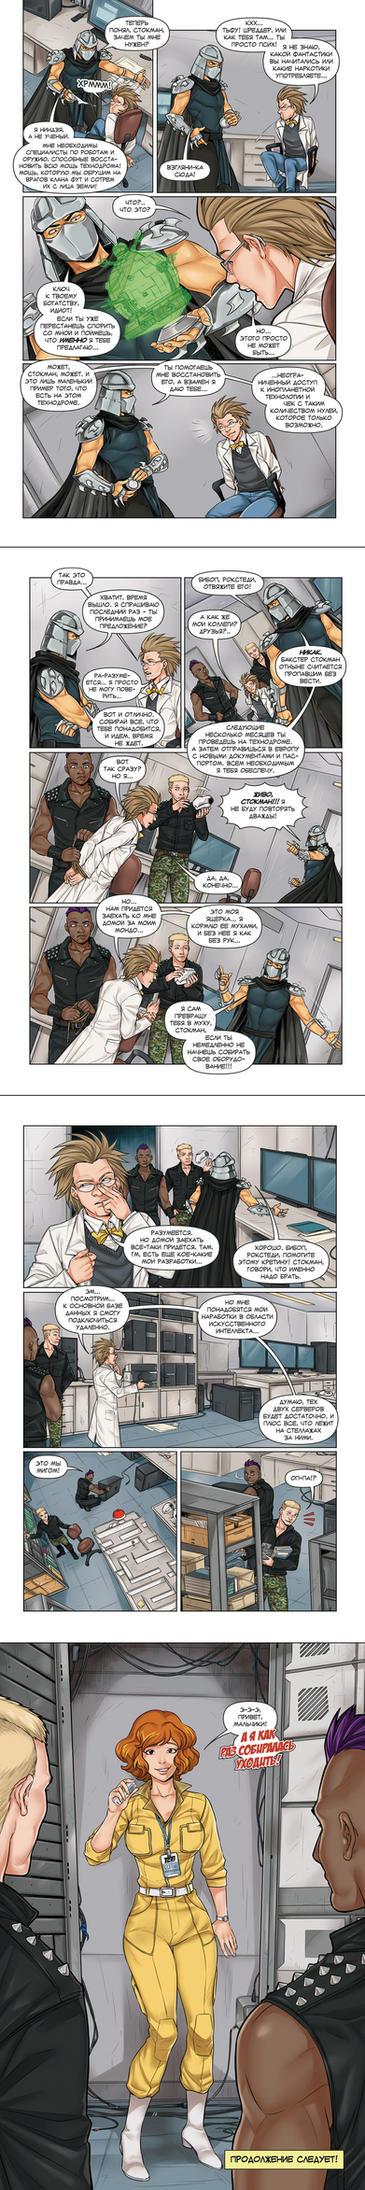 Origins 3: Baxter Stockman 5 by LinART